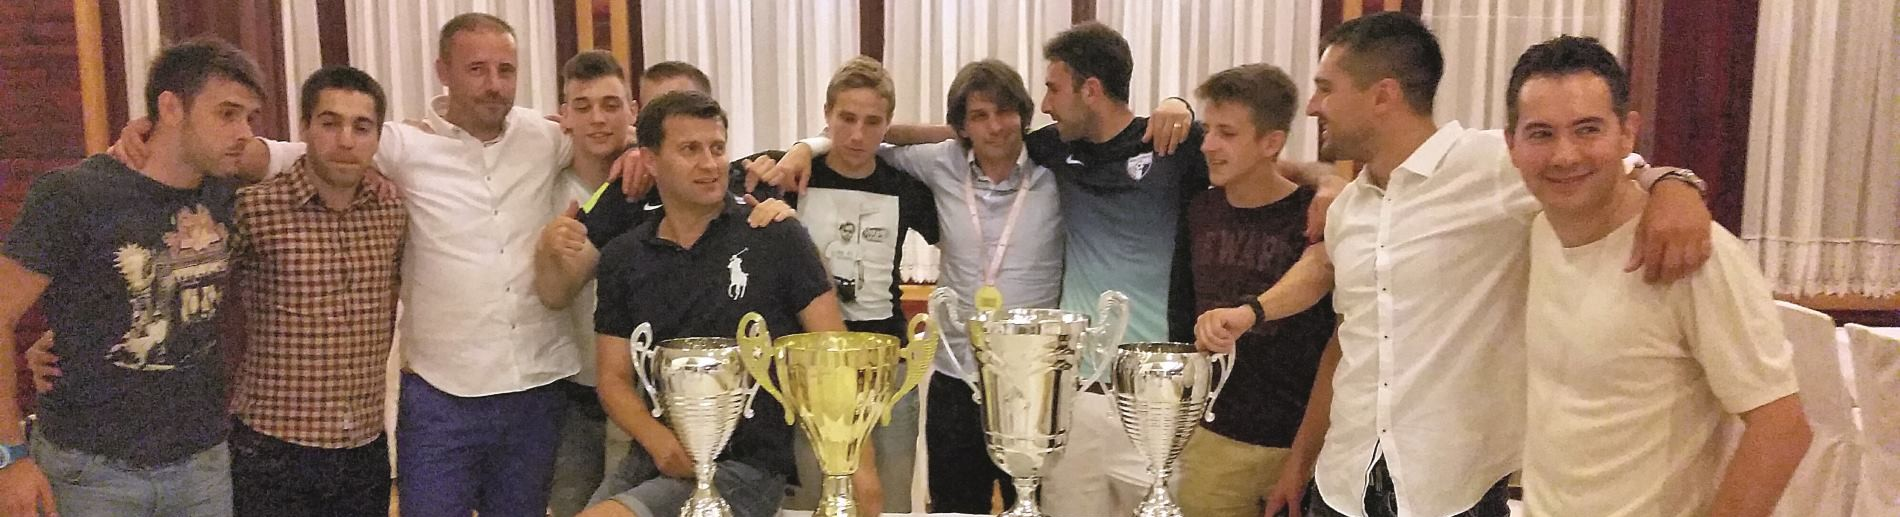 Samopouzdanje je bilo ključno da Nacional osvoji prvenstvo